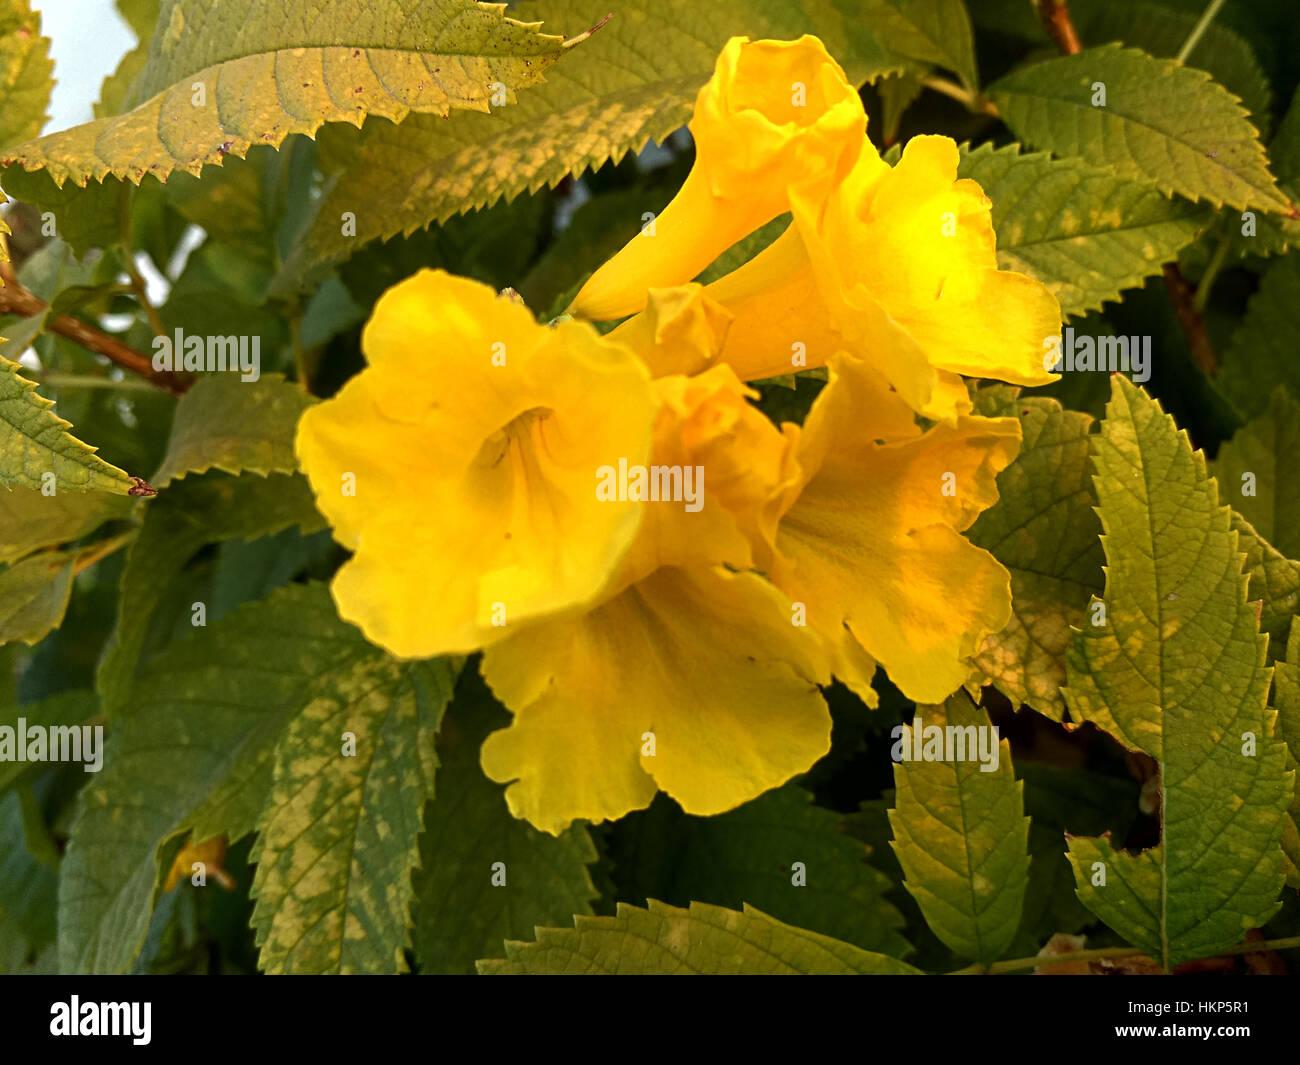 Yellow garden flowers with five petals stock photo 132638549 alamy yellow garden flowers with five petals mightylinksfo